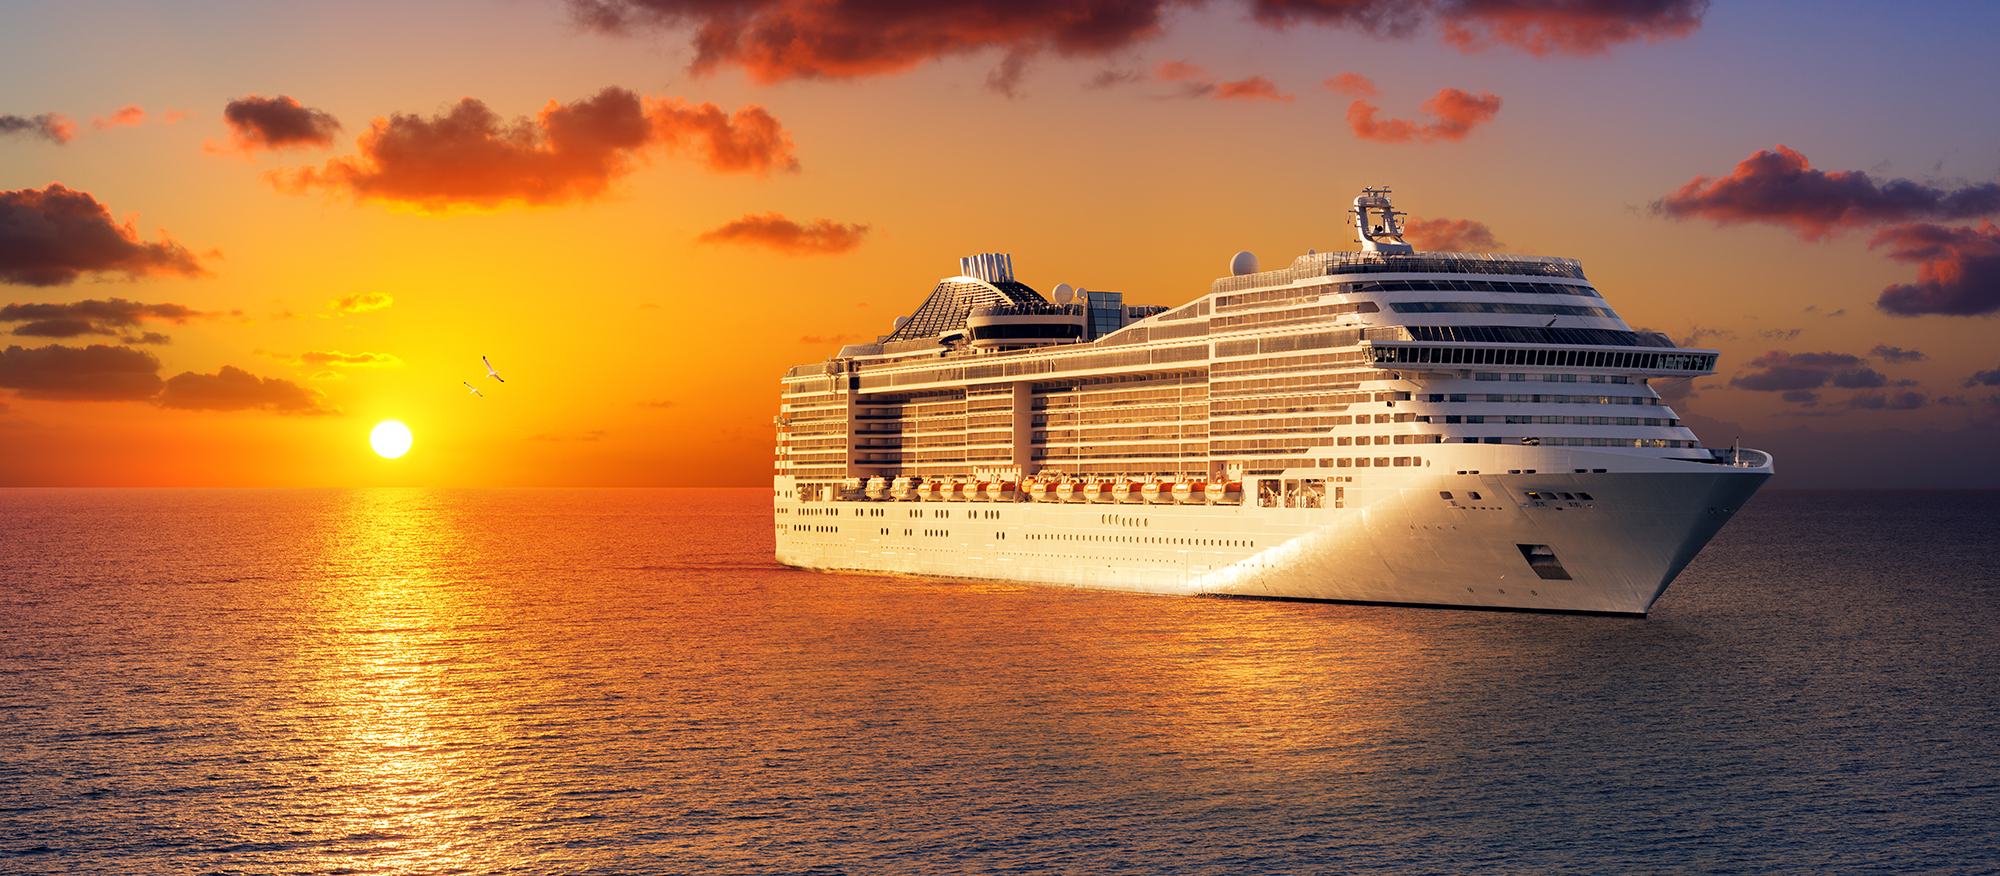 Tourism - cruise ship